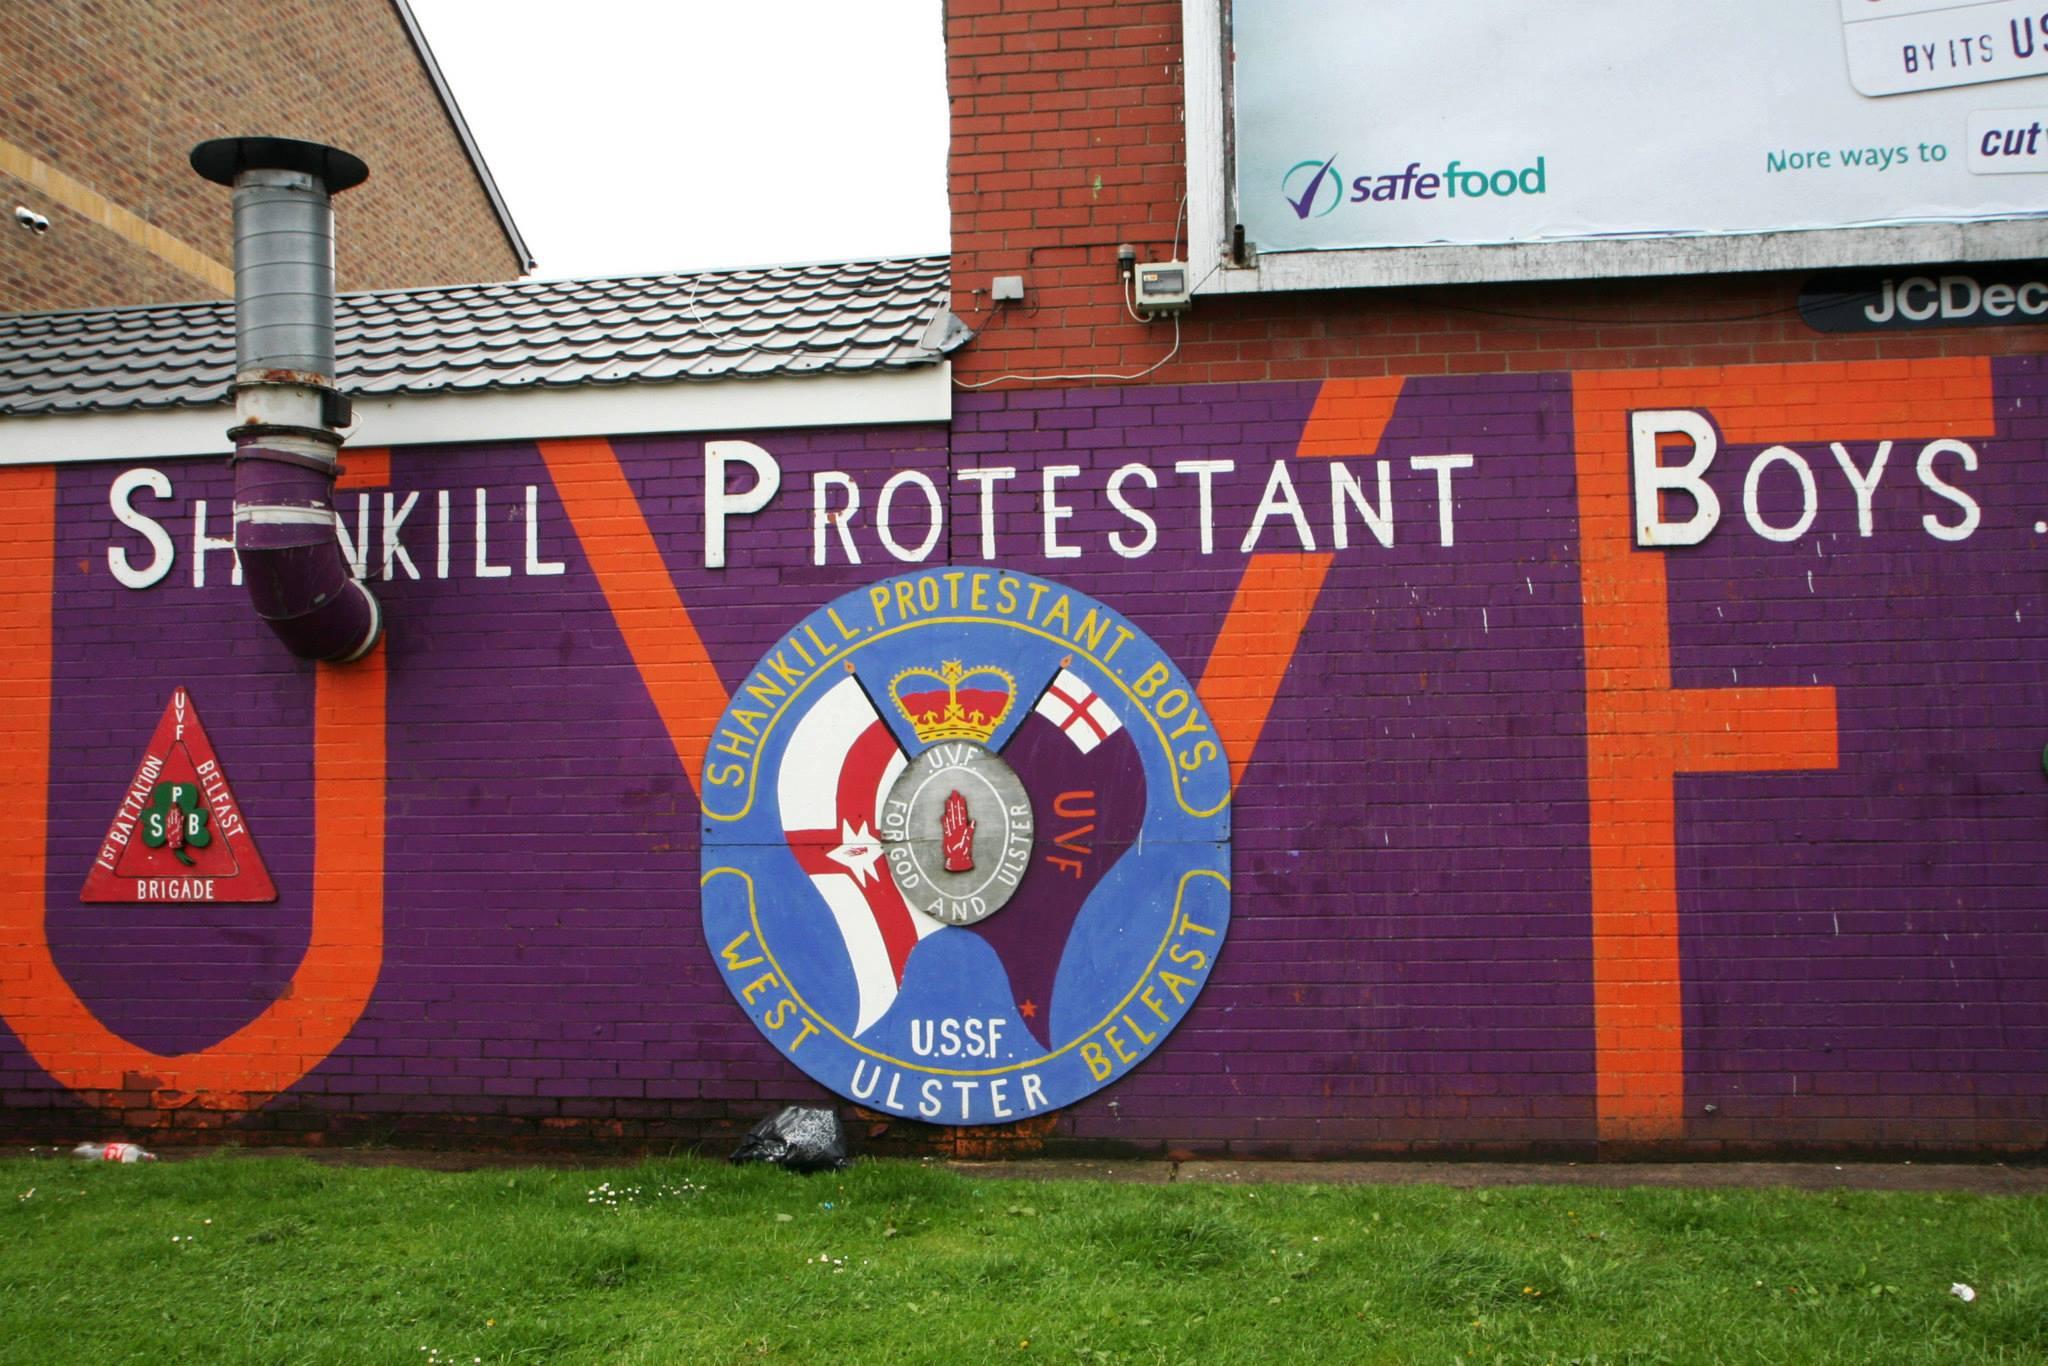 Welkomstmuur van de 'Shankill Protestant Boys'